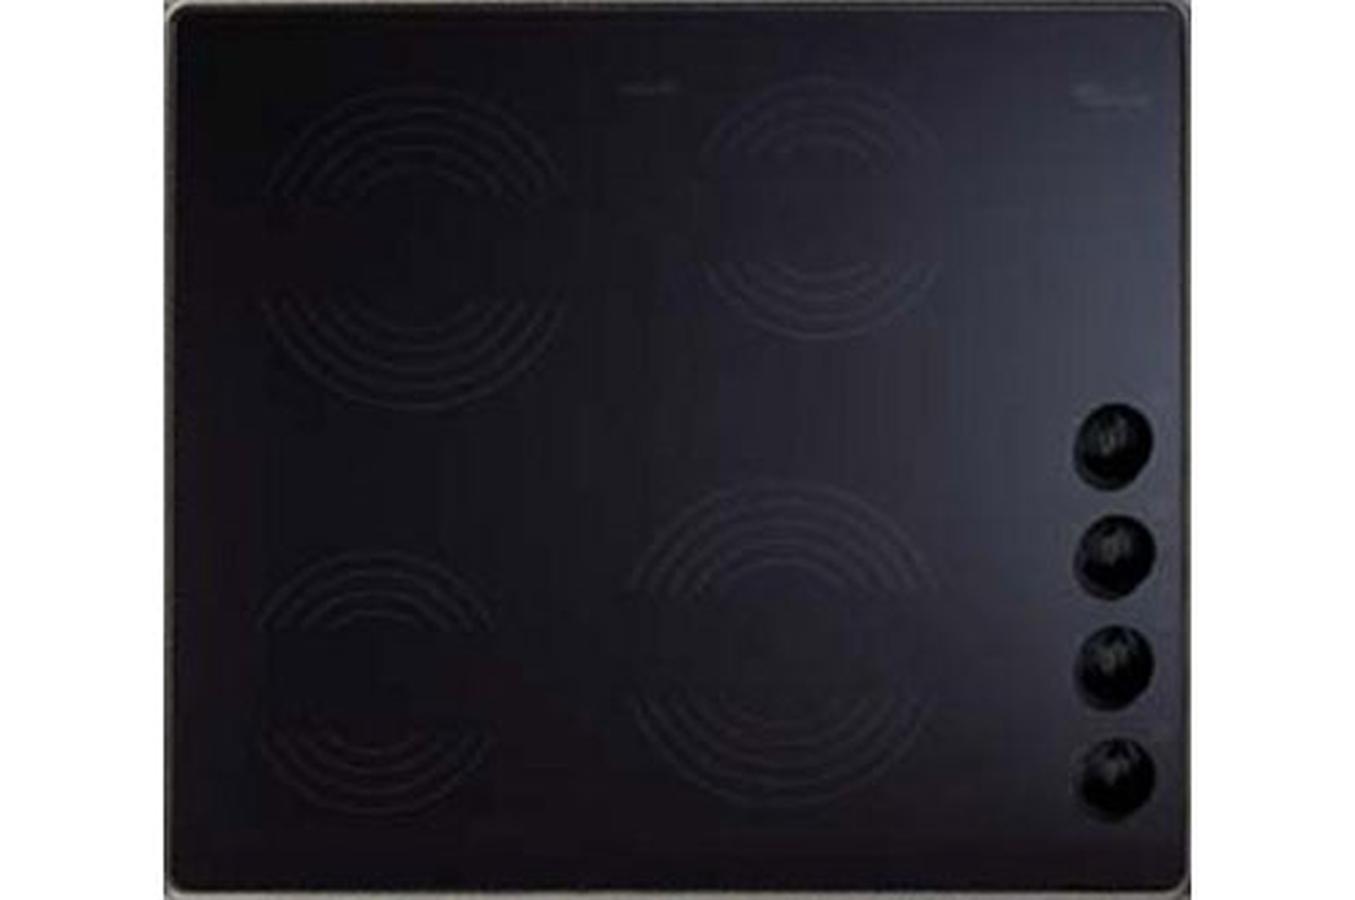 plaque vitroc ramique whirlpool akm613 ix 01 noir 3183416 darty. Black Bedroom Furniture Sets. Home Design Ideas